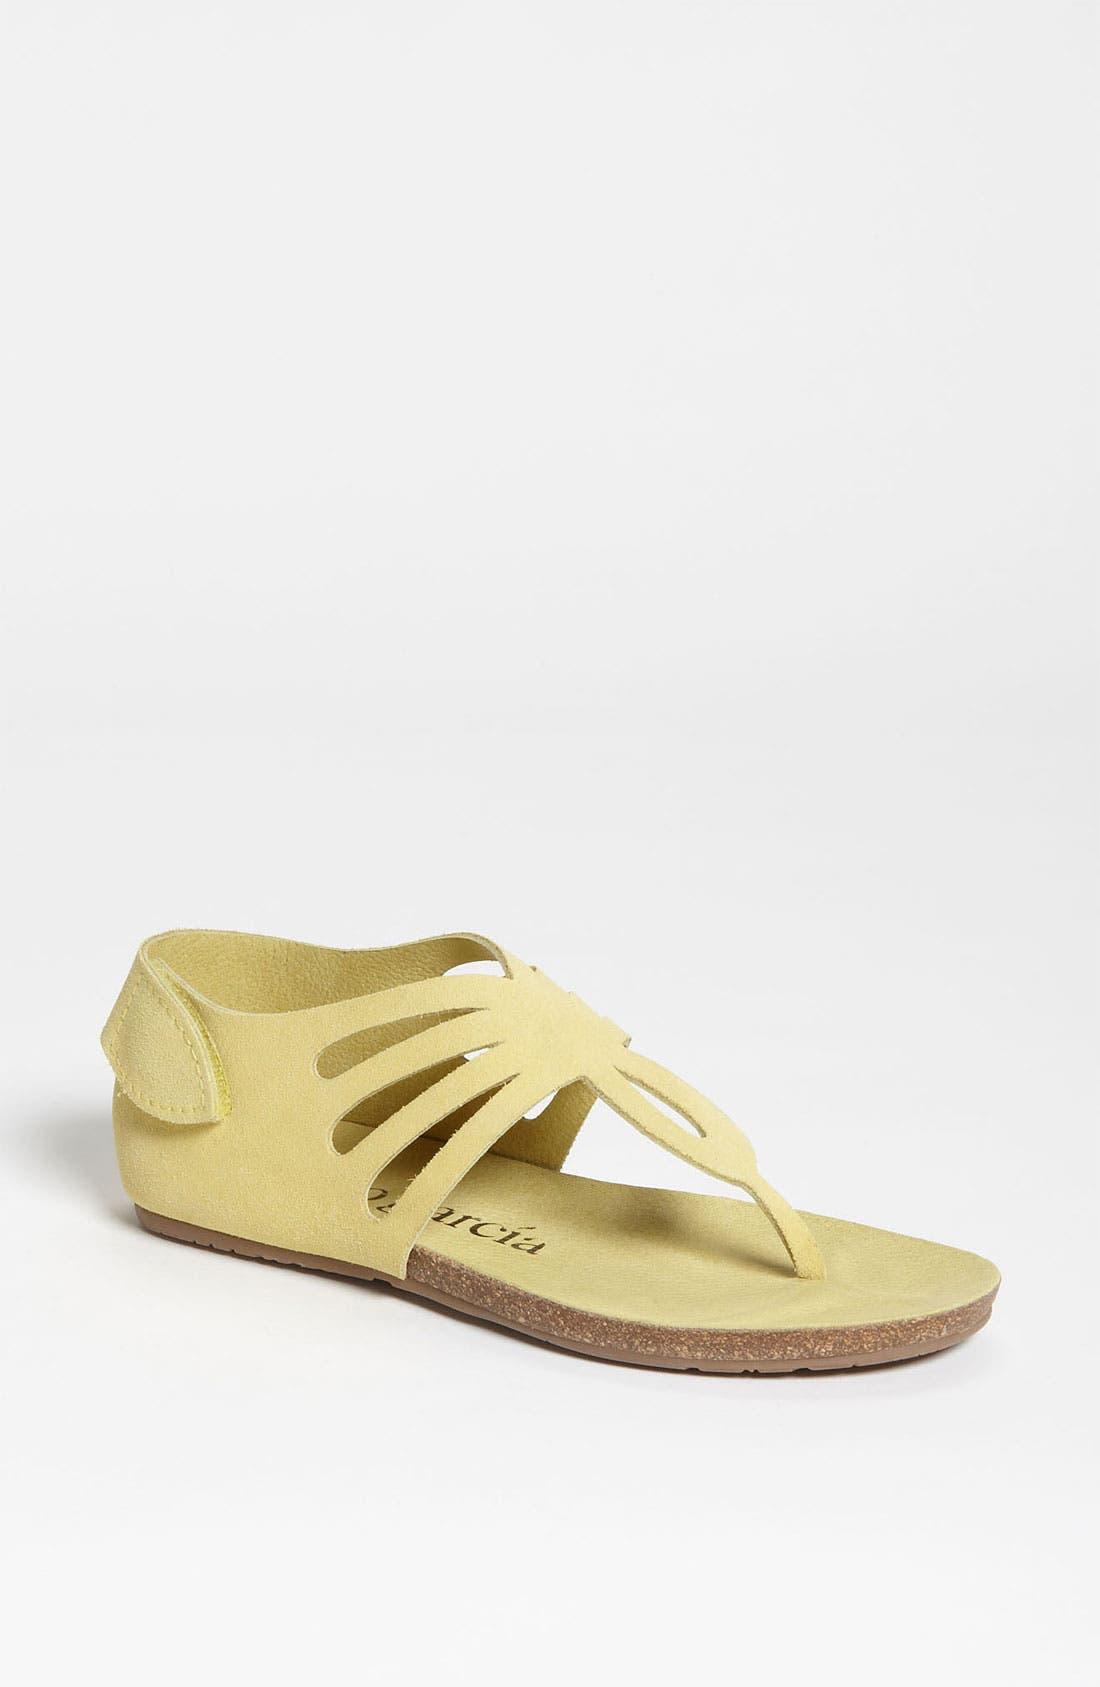 Alternate Image 1 Selected - Pedro Garcia 'Jules' Flat Sandal